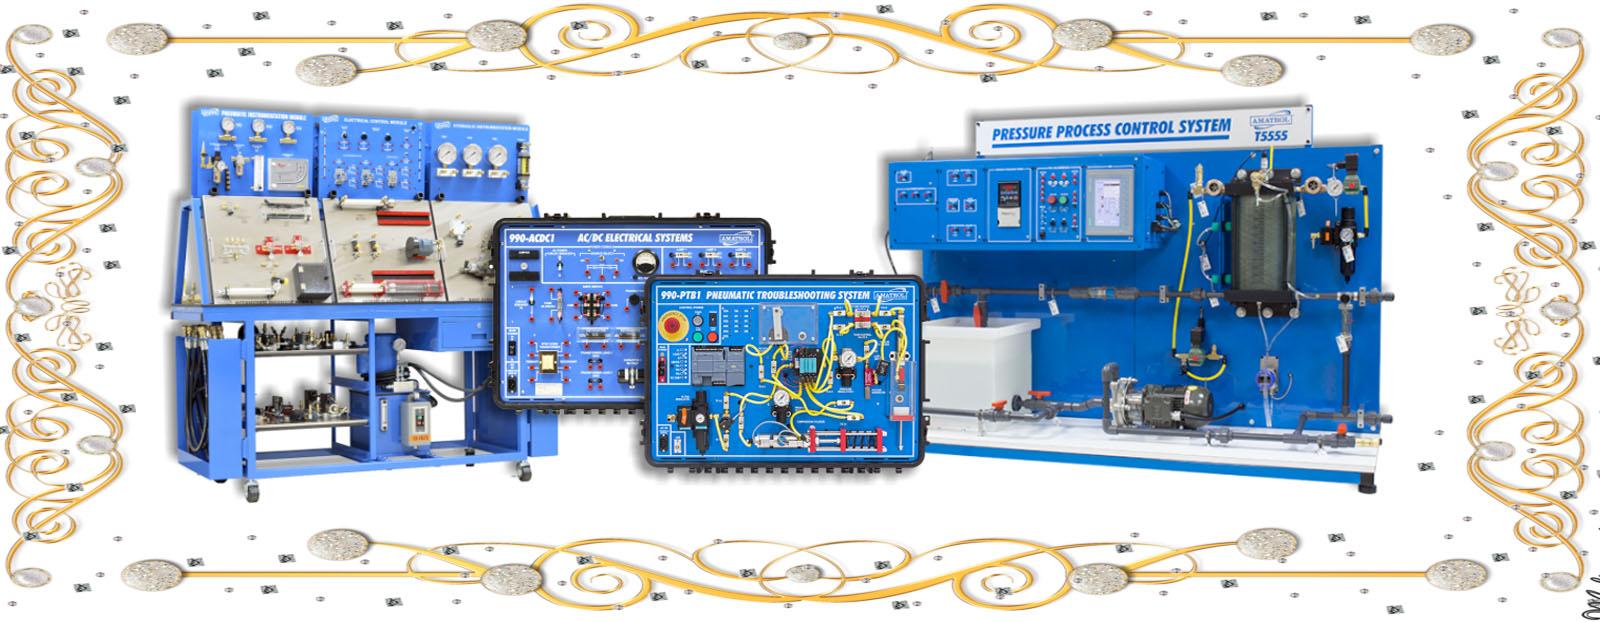 Measurement and Instrumentation Lab Equipment   Mechanical Lab Equipment